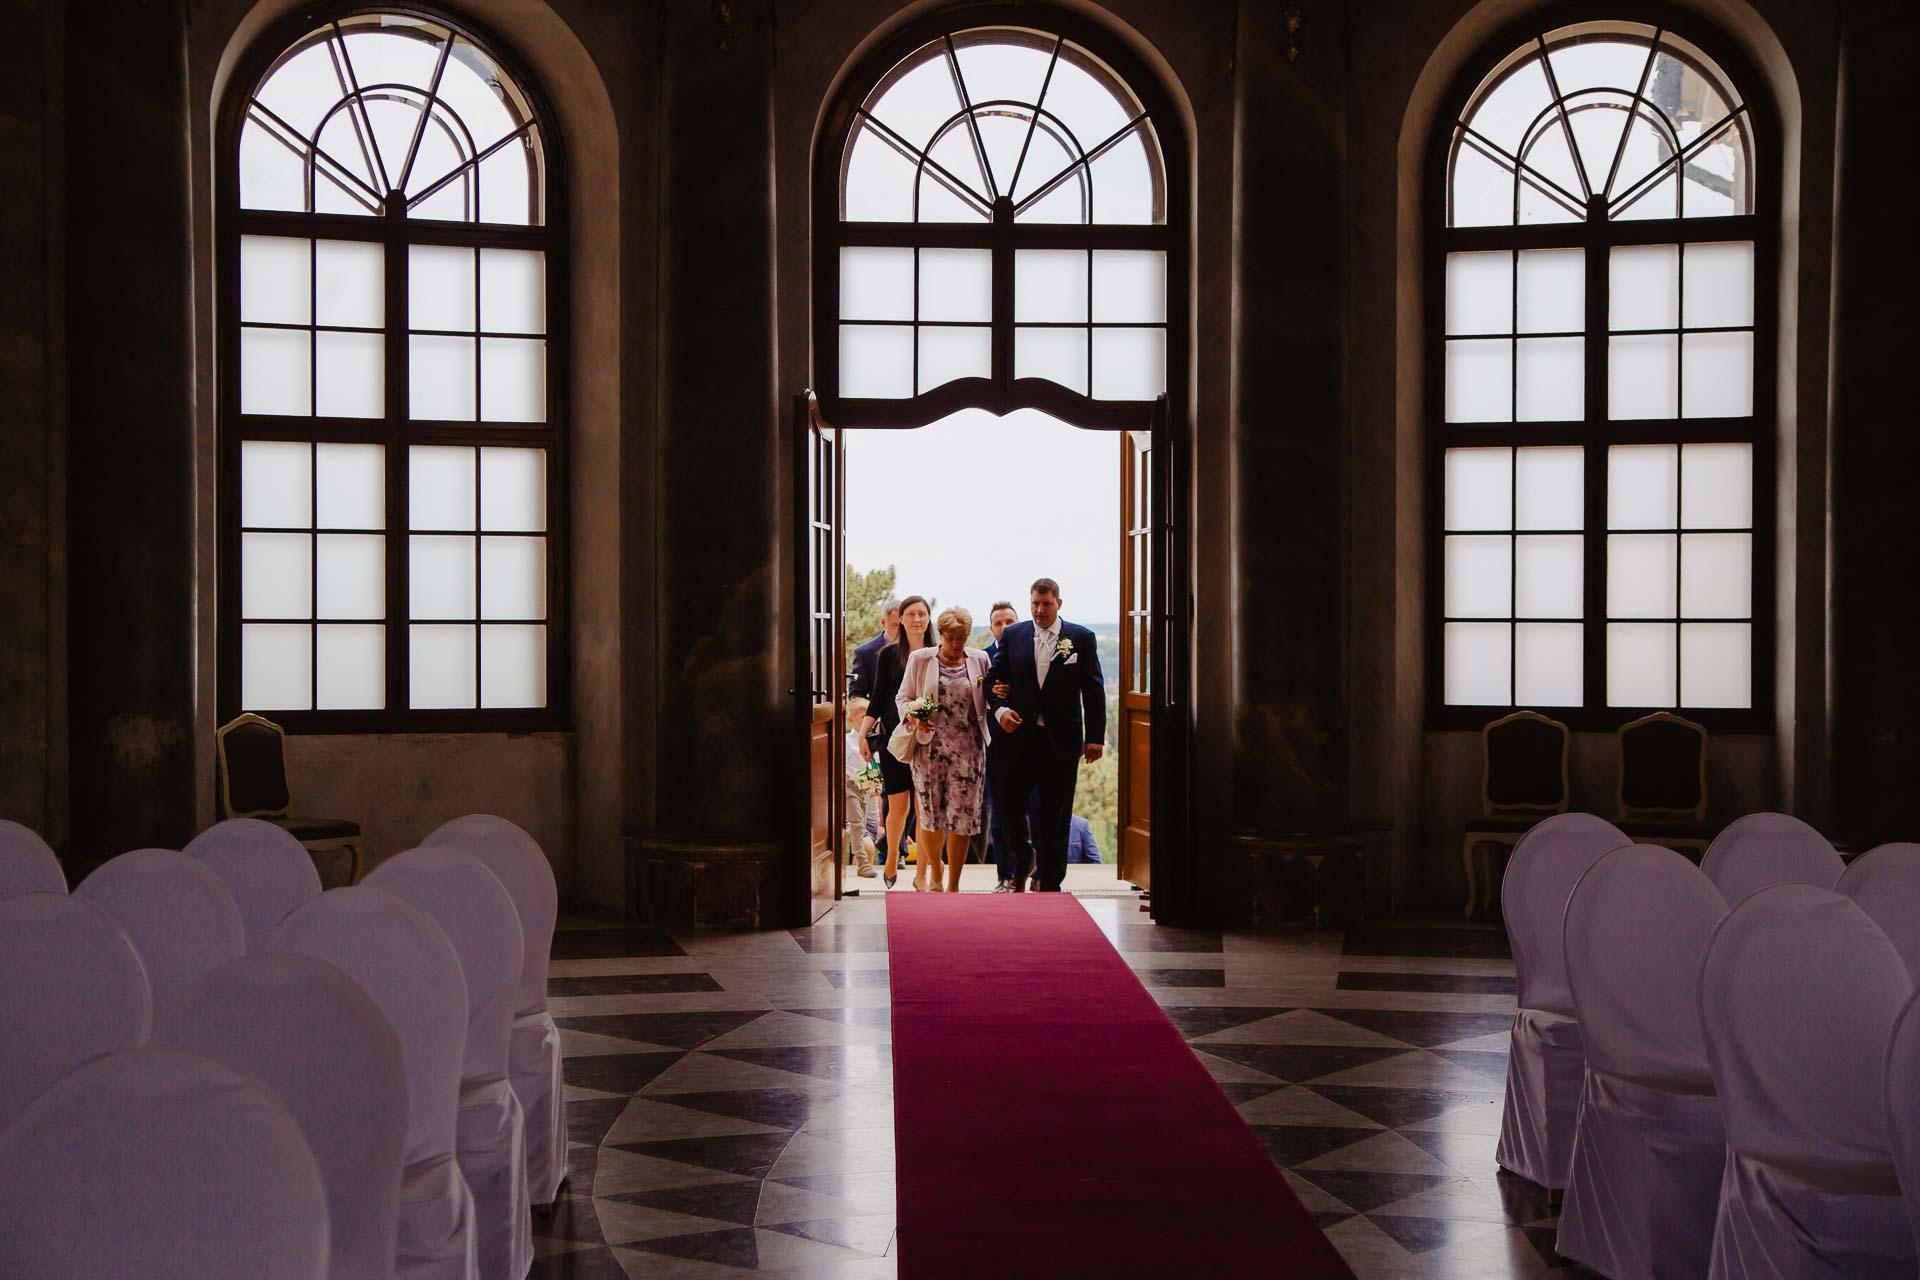 Svatební-fotograf-zámek-Karlova-Koruna-Chlumec-nad-Cidlinou-17